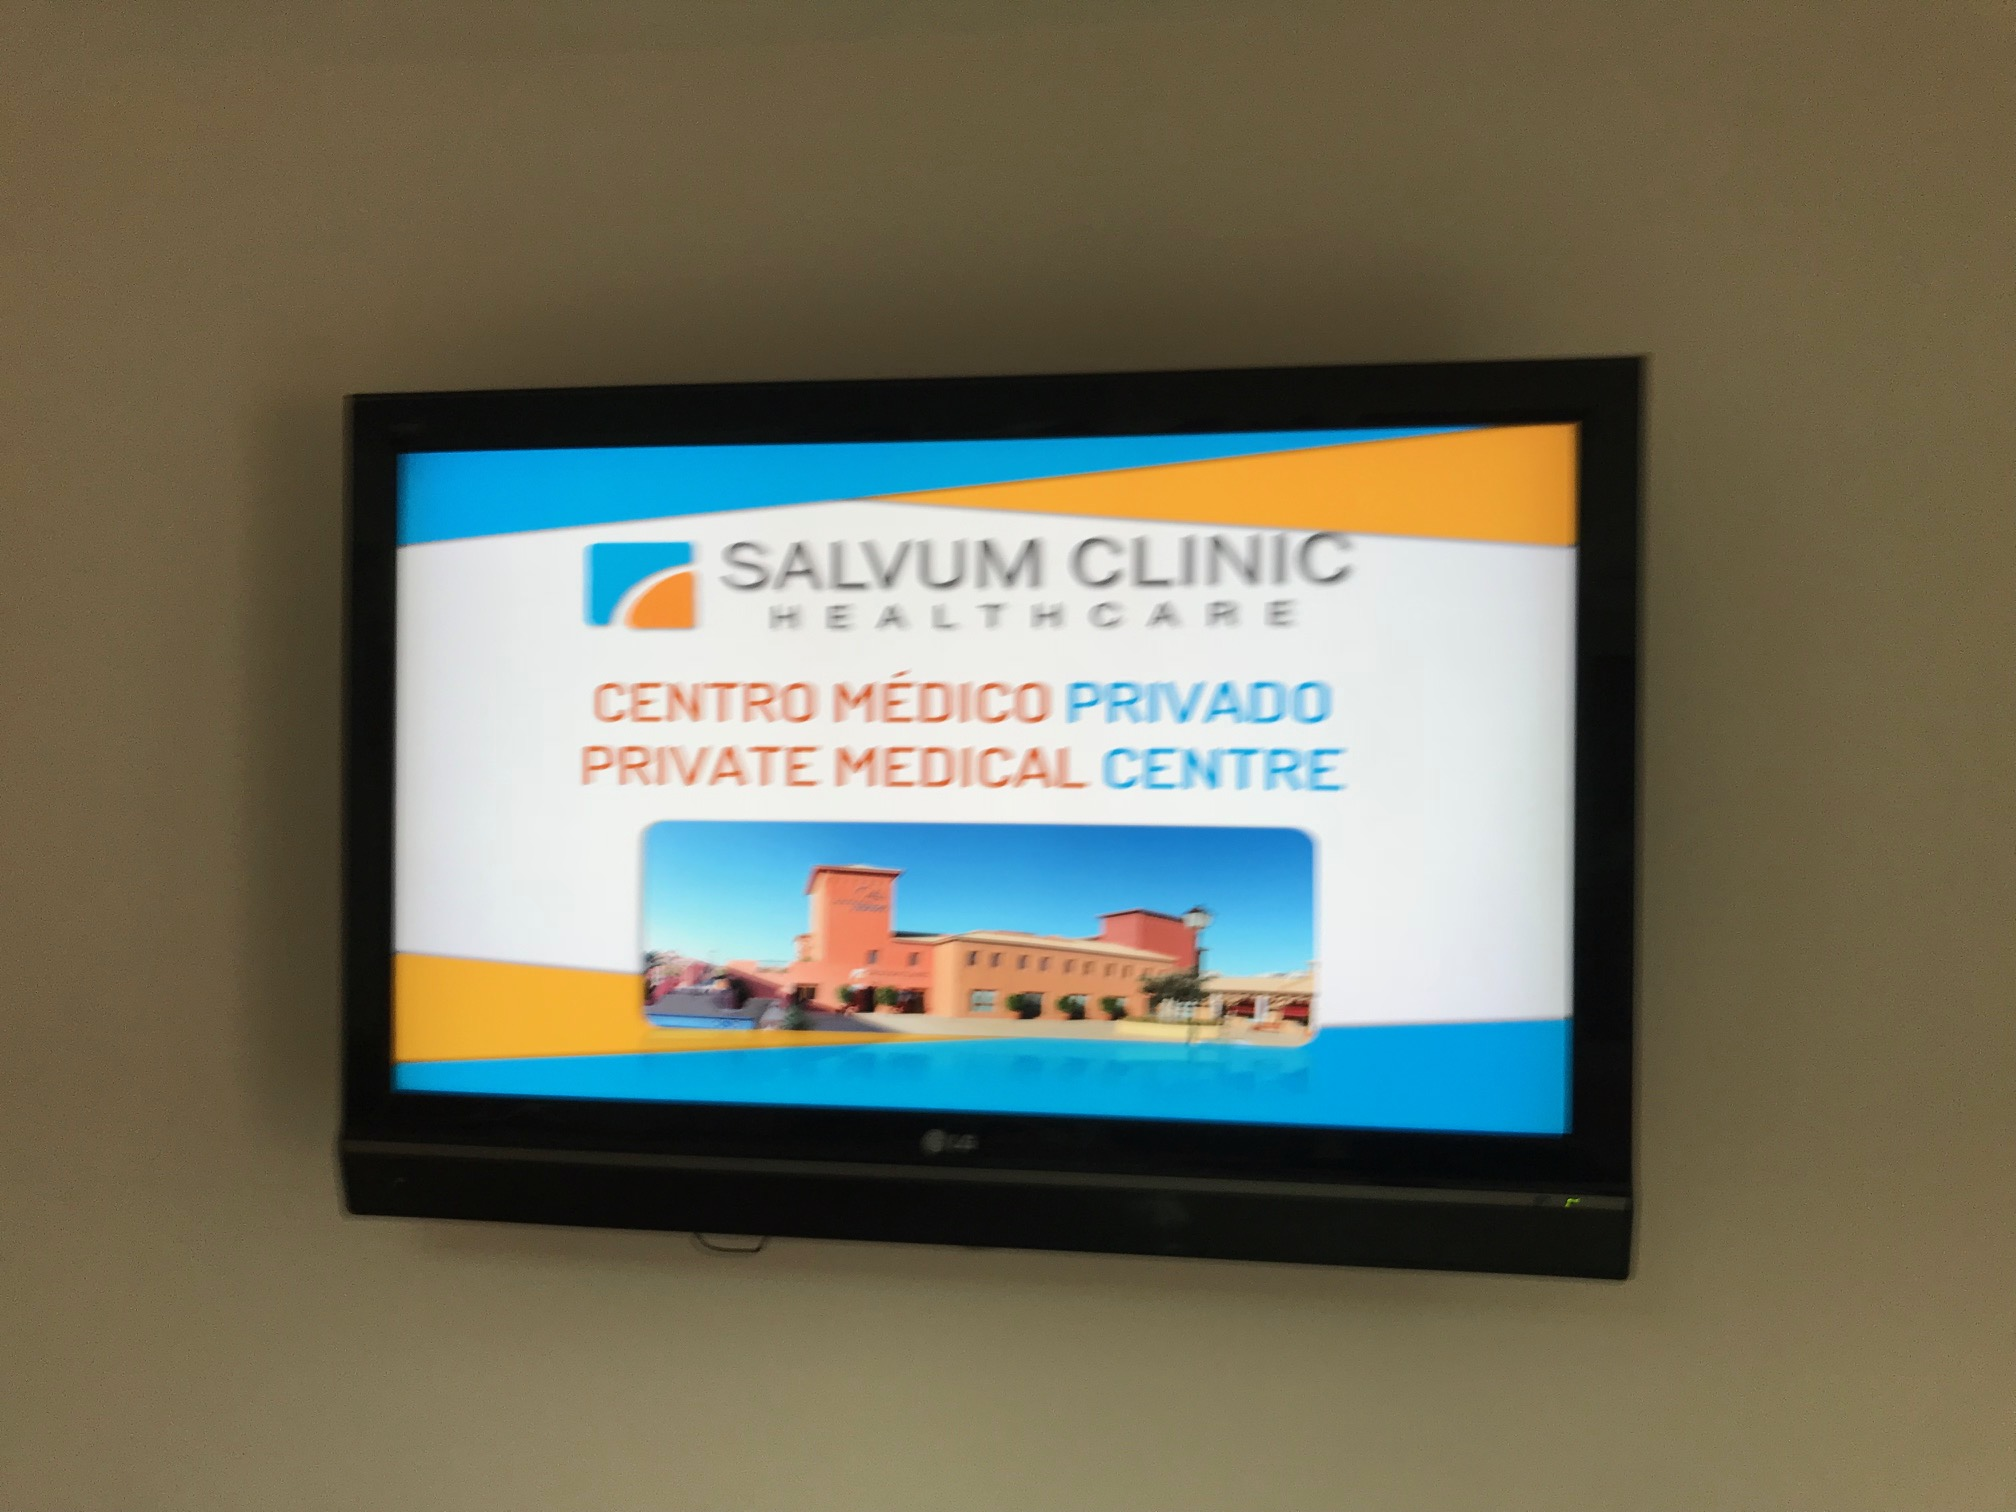 info om klinikken